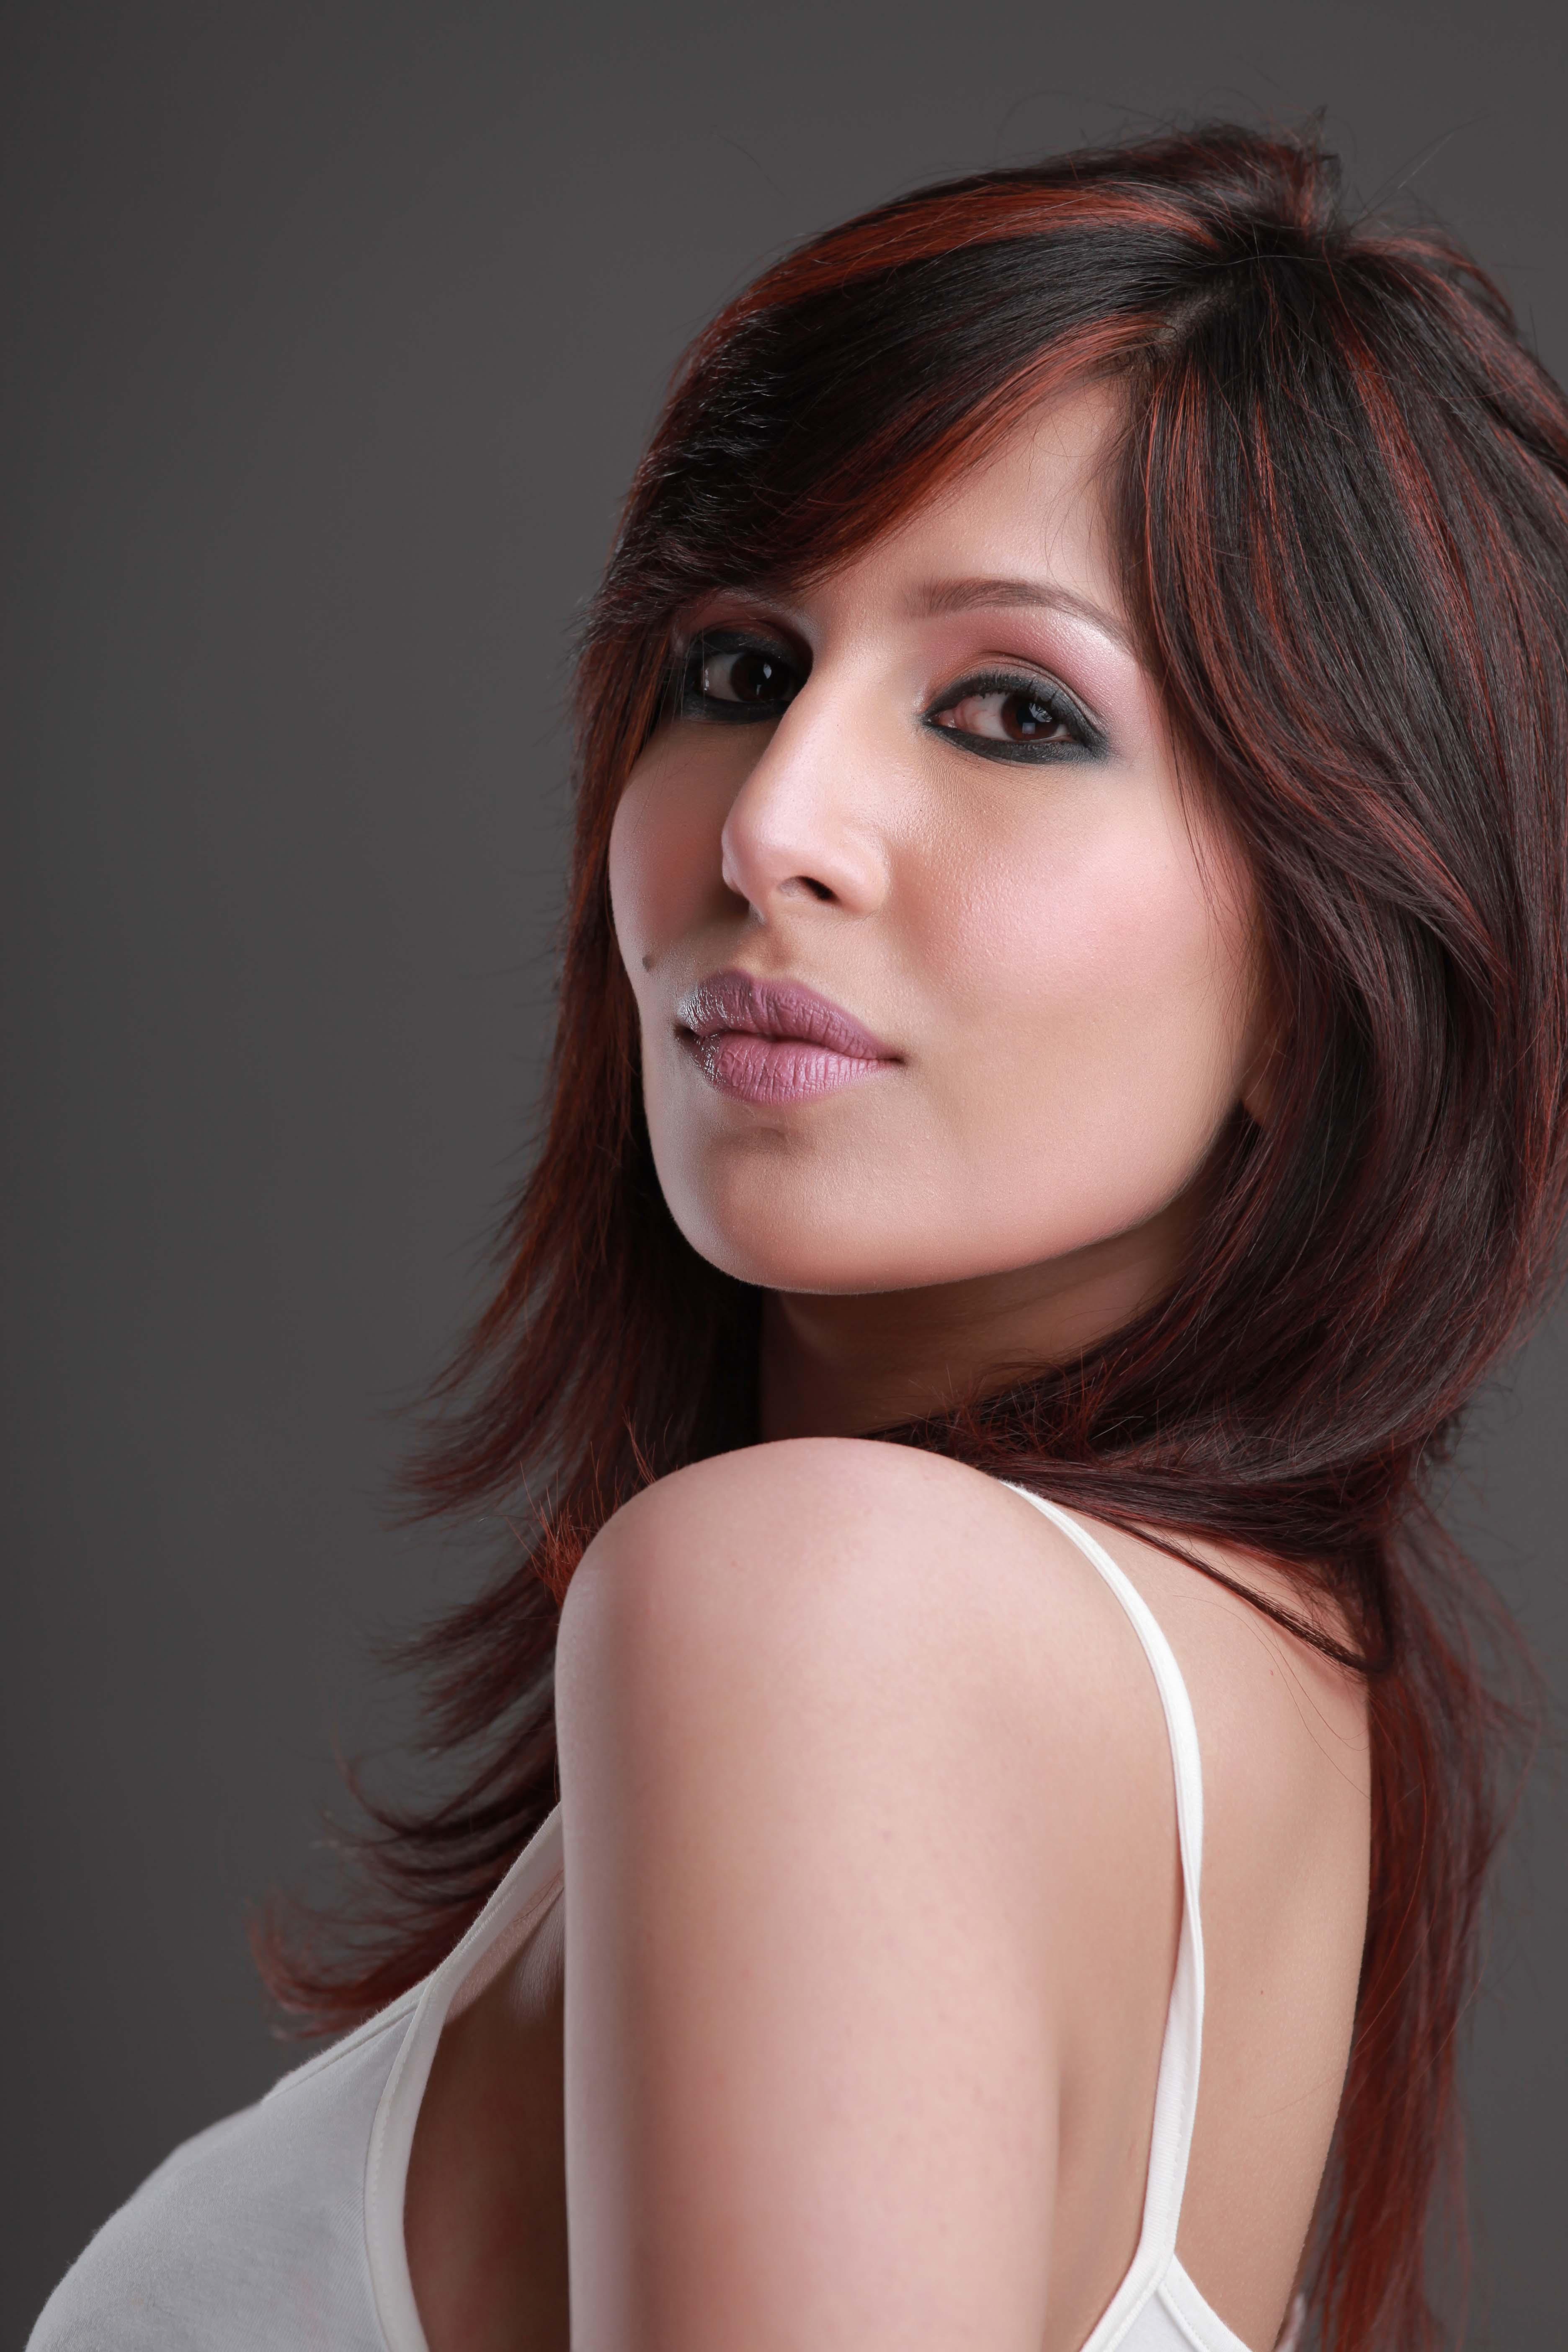 Veet Miss Super Model Contest 2012 - Rewaj | Women Lifestyle